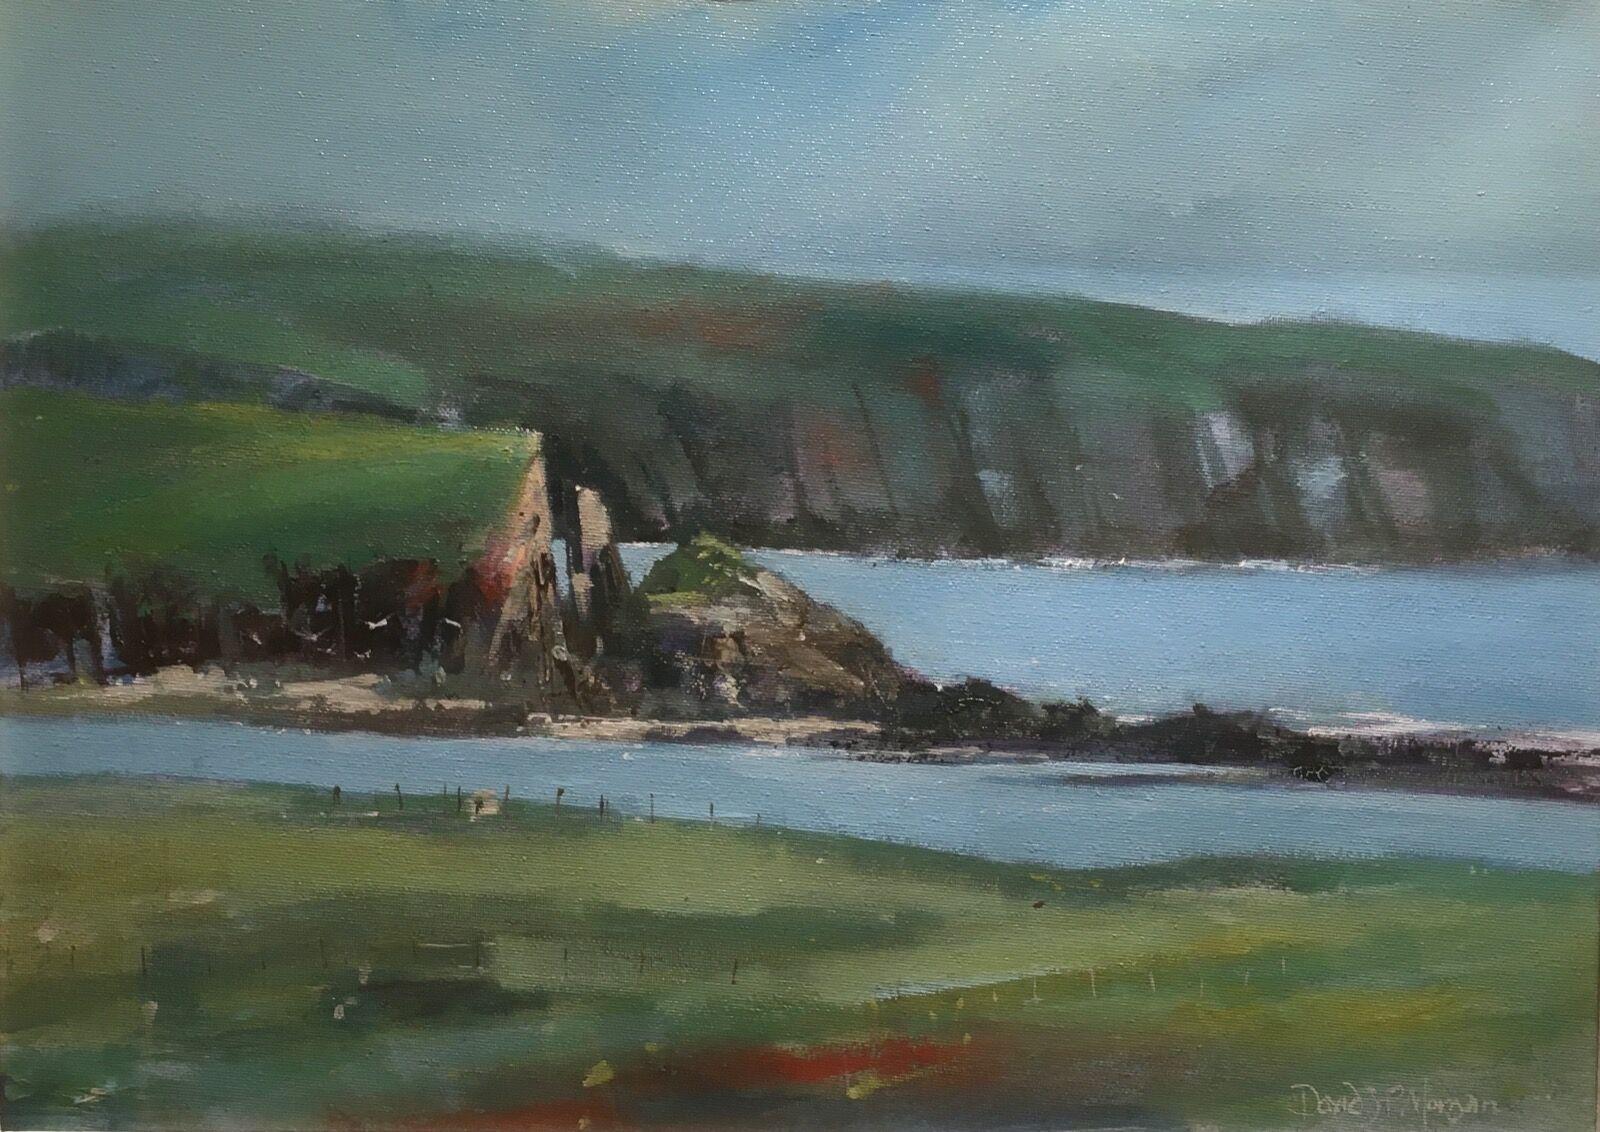 Low tide. - Little Sound, Caldey Island.